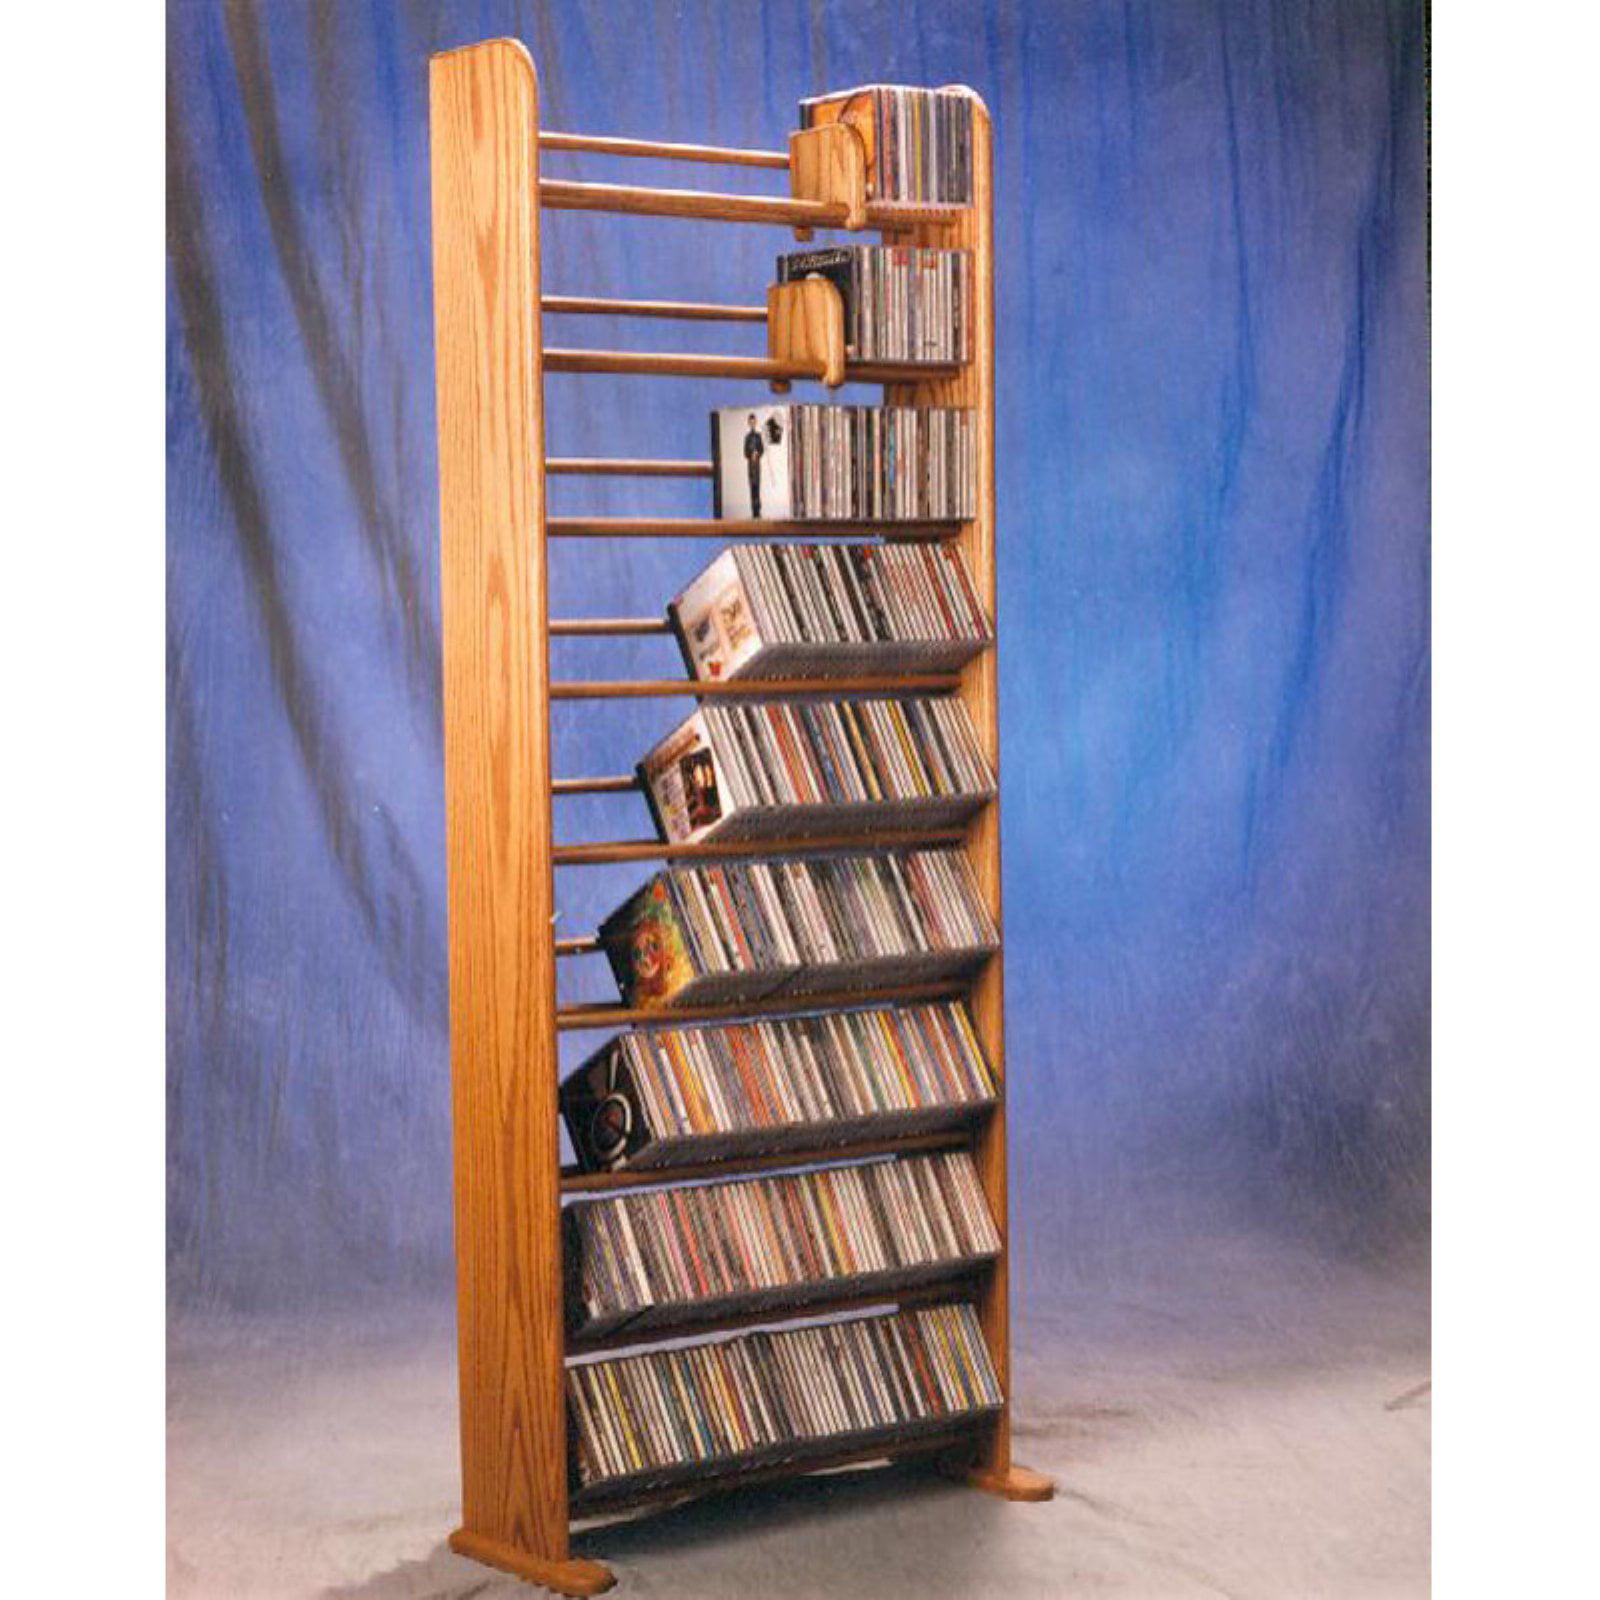 The Wood Shed Solid Oak 9 Row Dowel 504 CD Media Rack